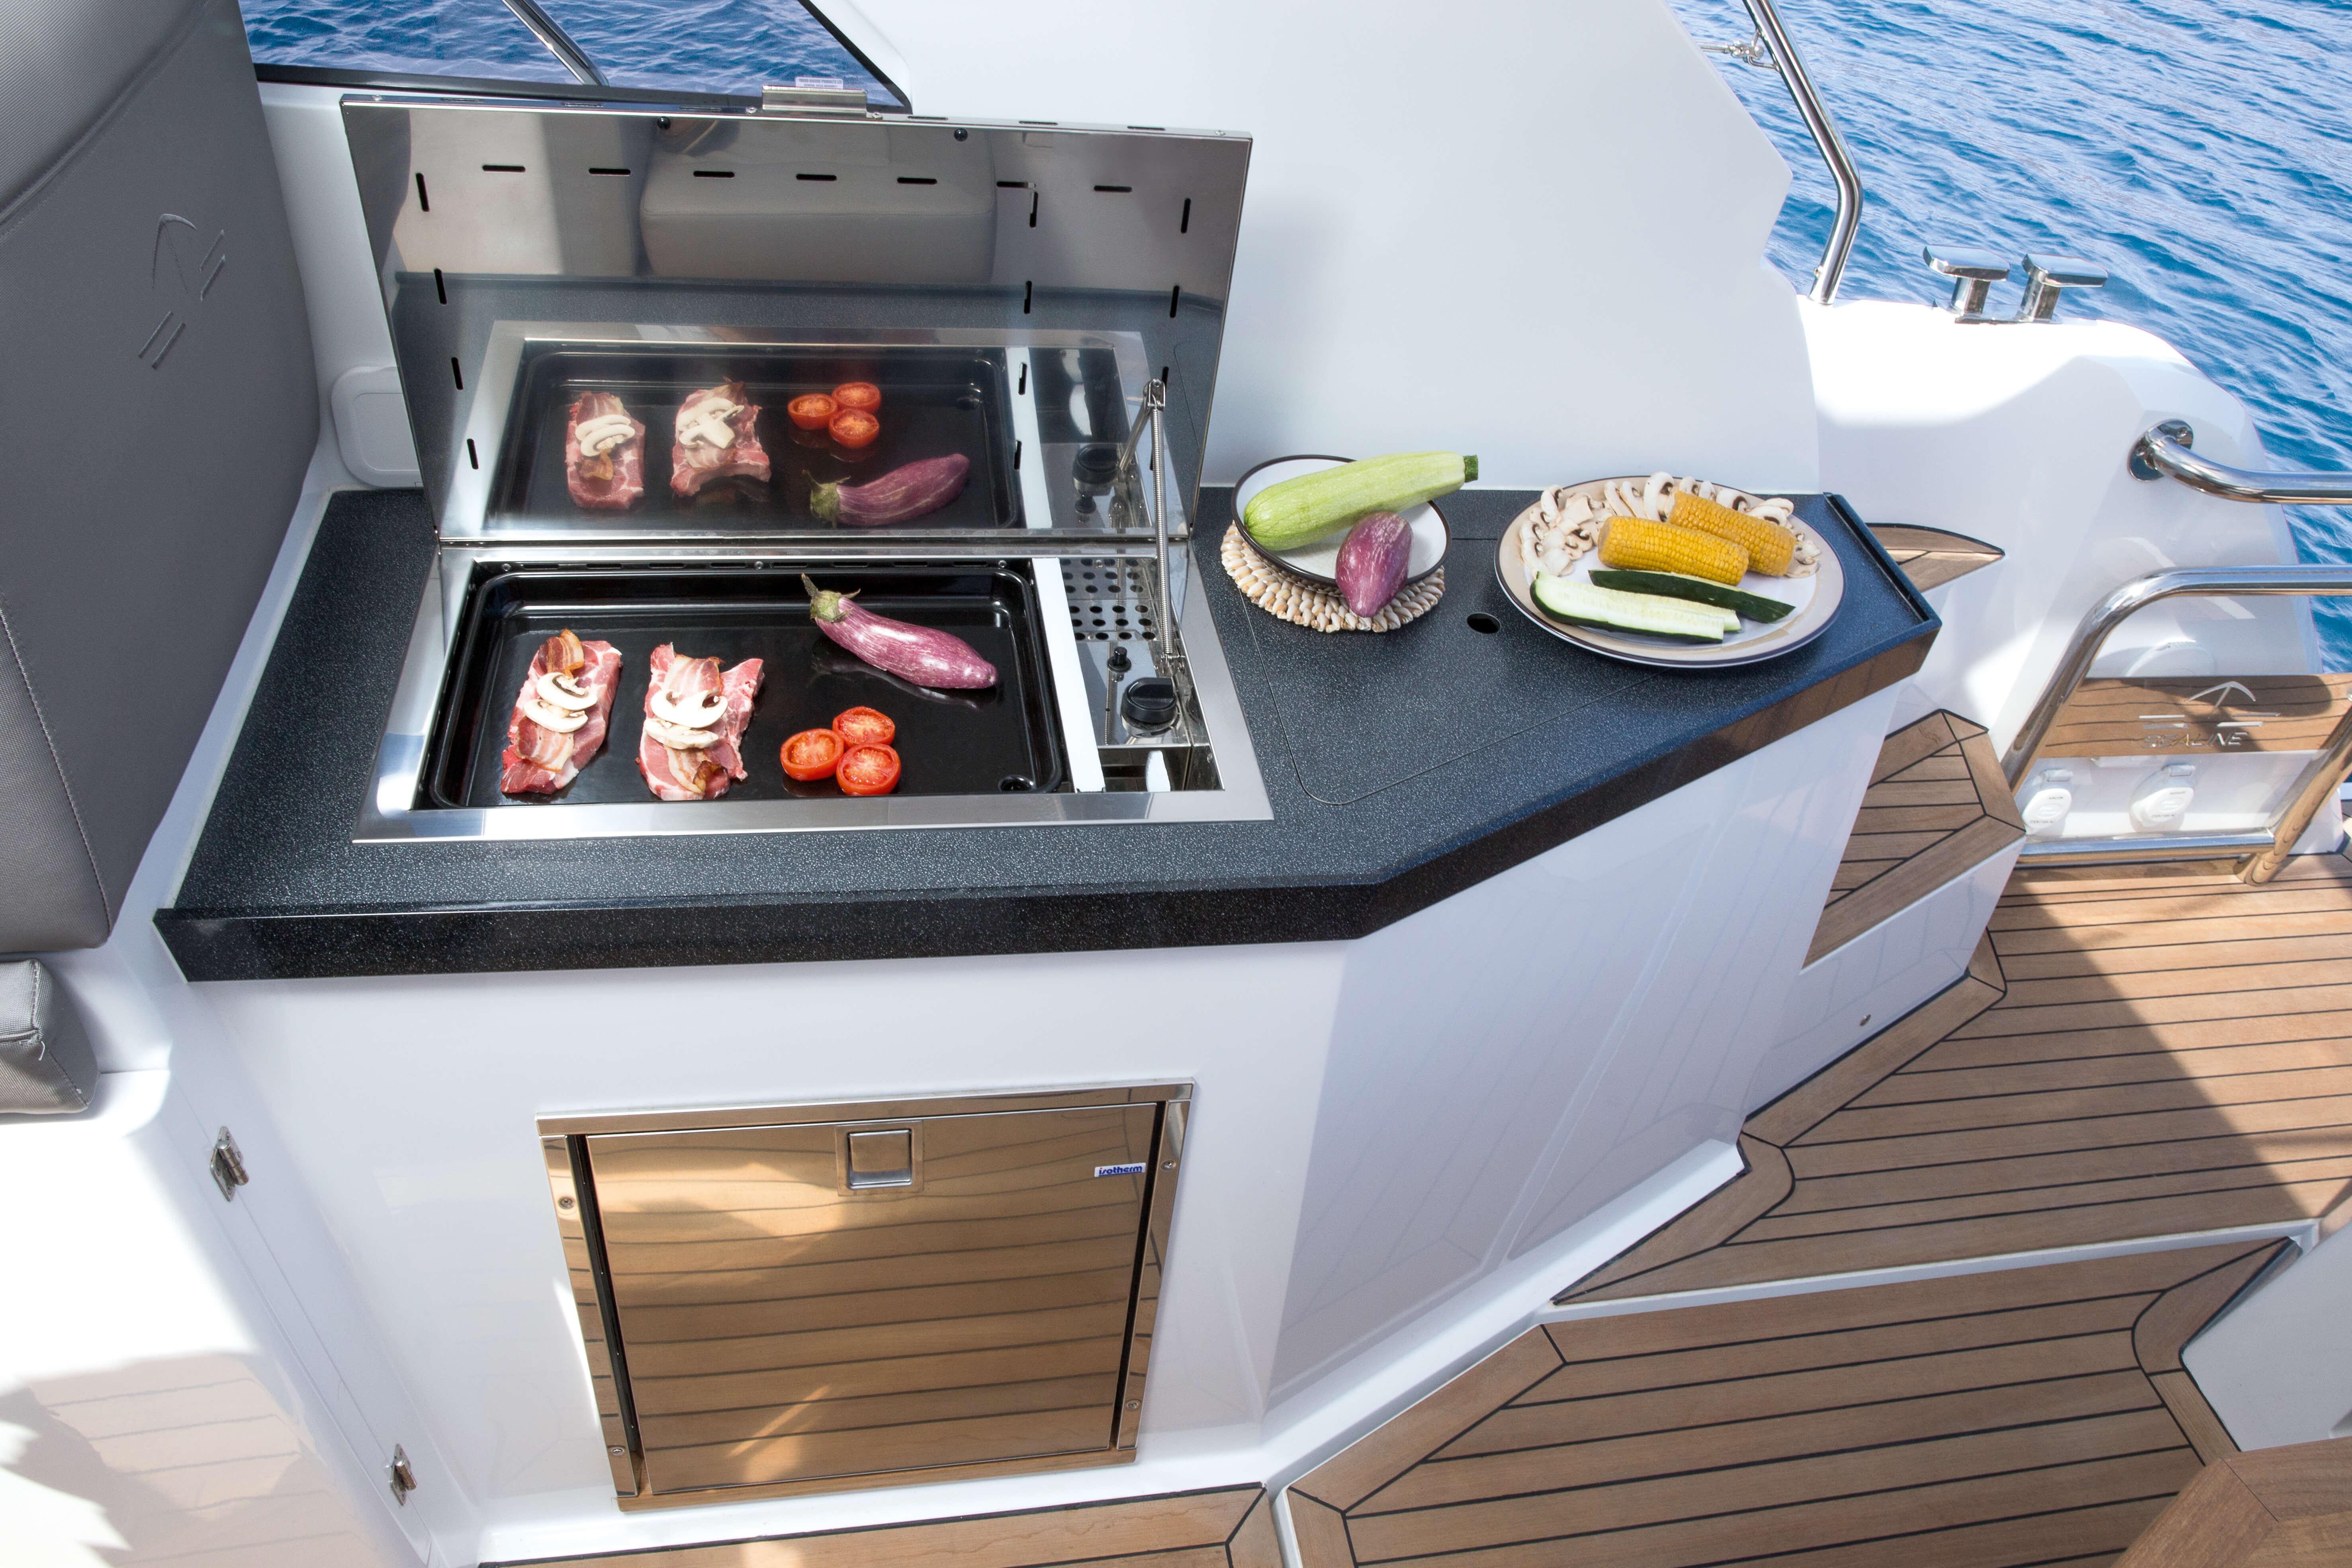 Exterior at anchor | BBQ grill | Sealine